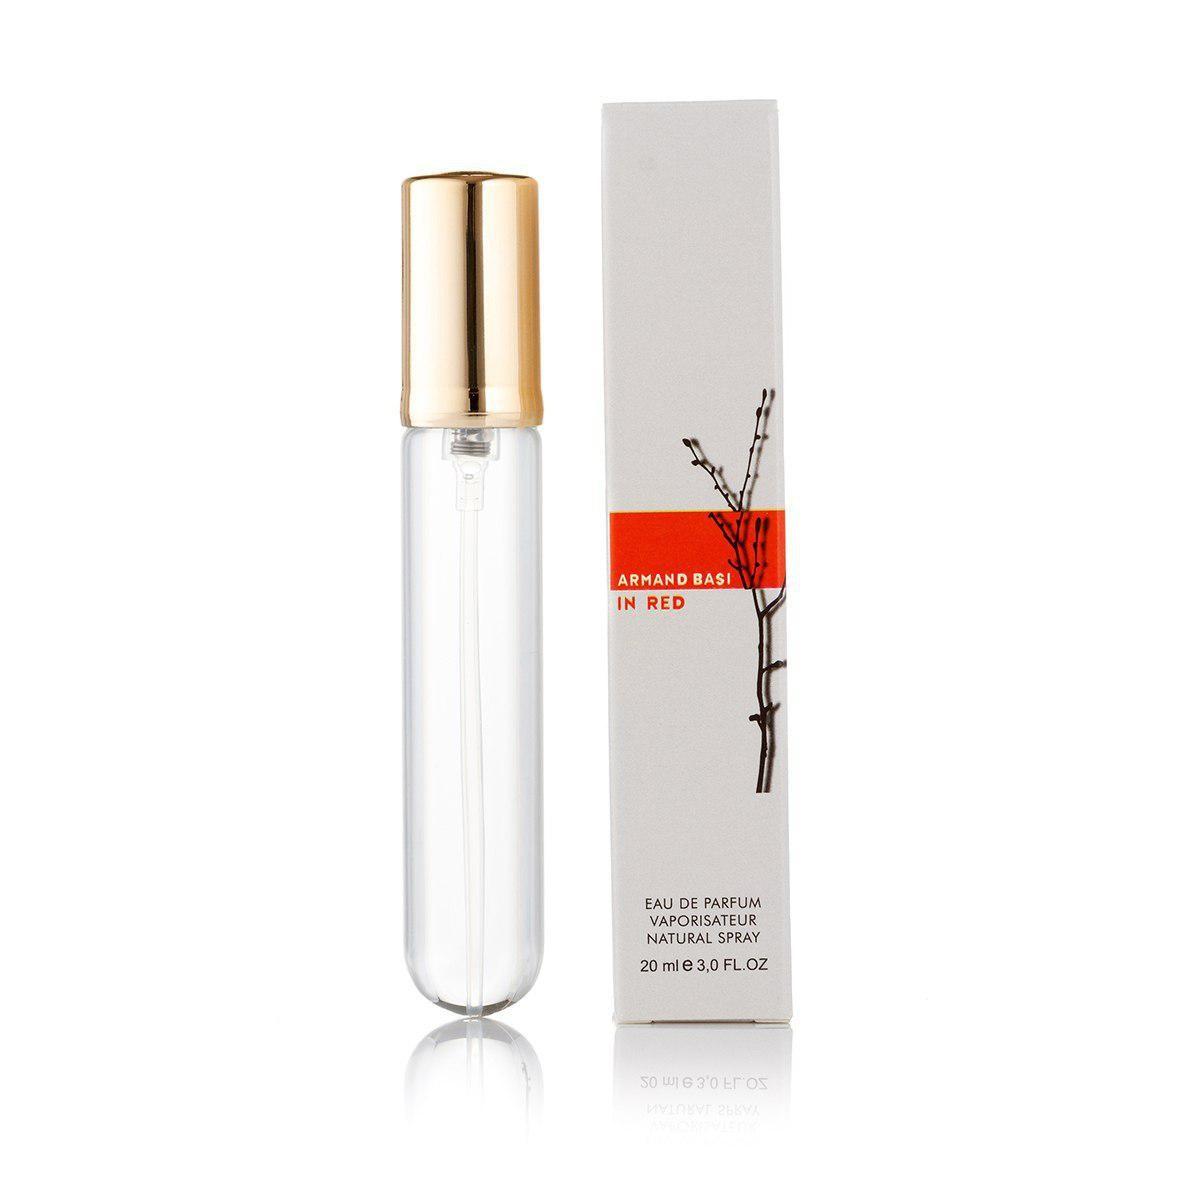 Armand Basi In Red - Parfum Stick 20 ml